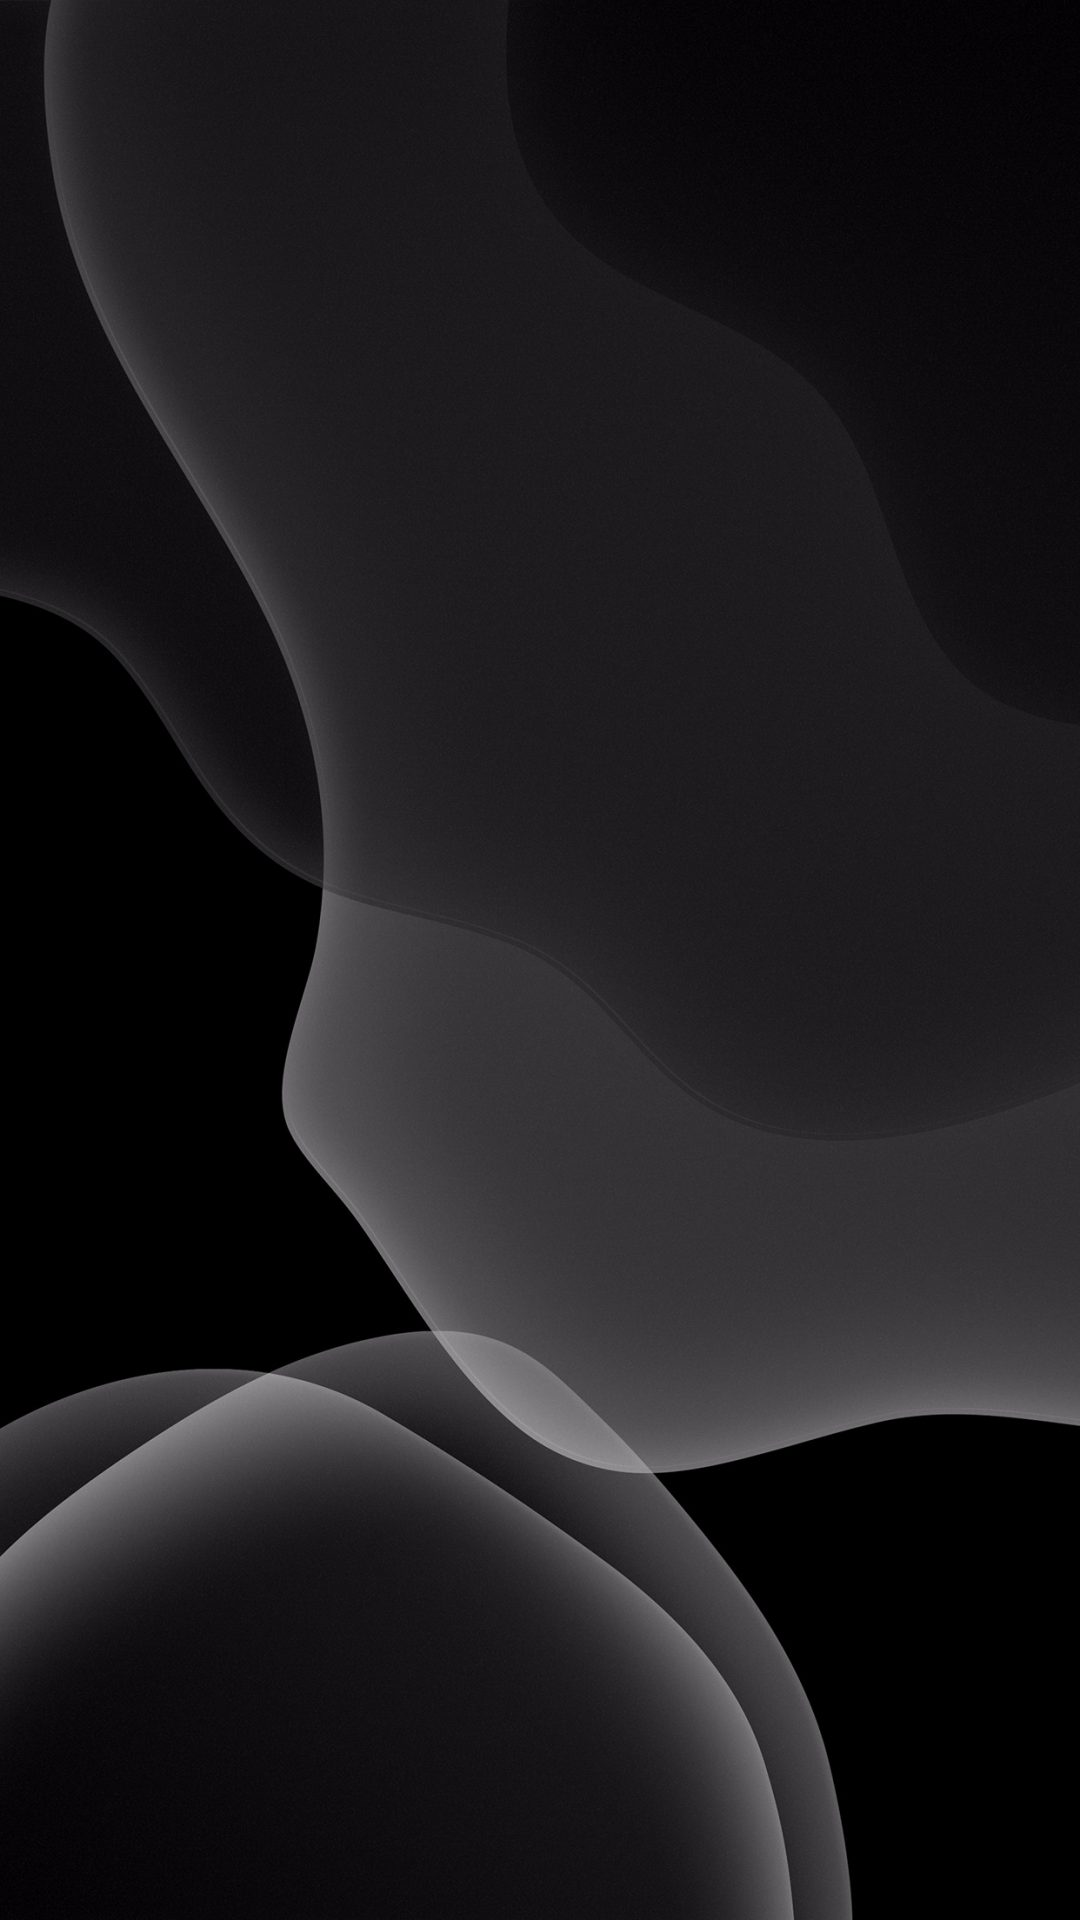 ios 13 gray black wallpaper